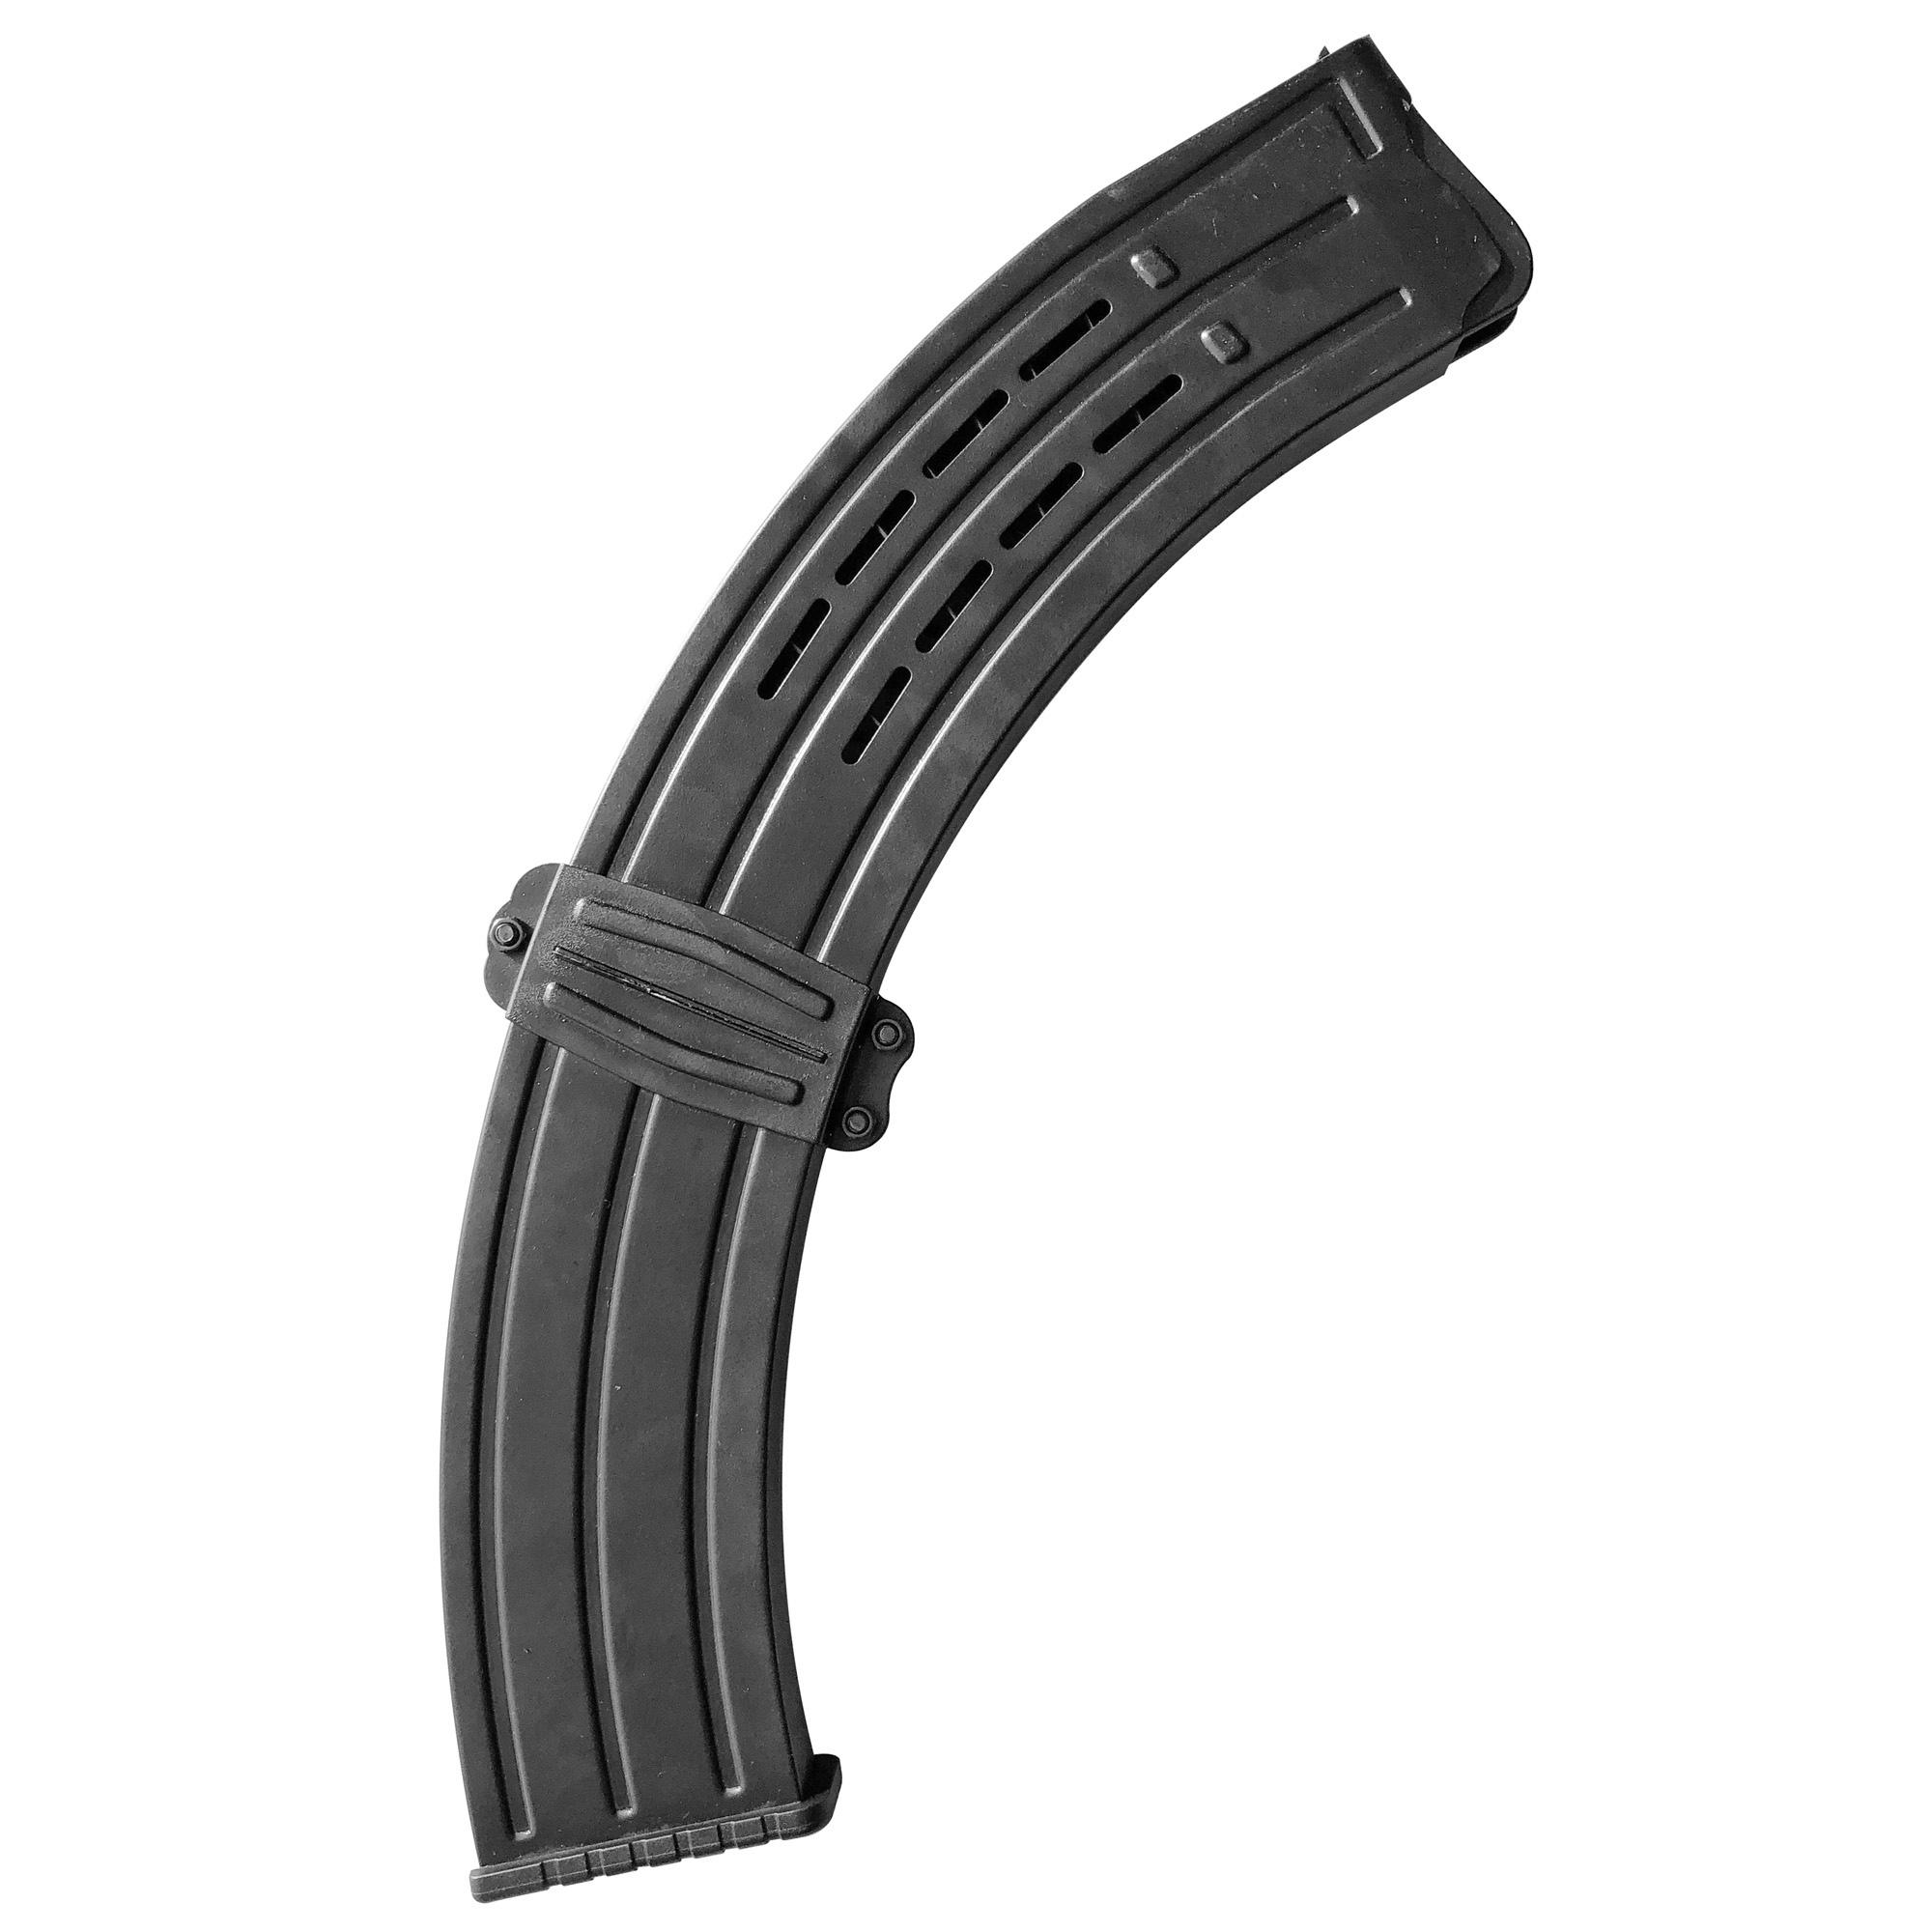 Rock Island Armory VR80 & VR60 12ga 19 Round Magazine · DK Firearms